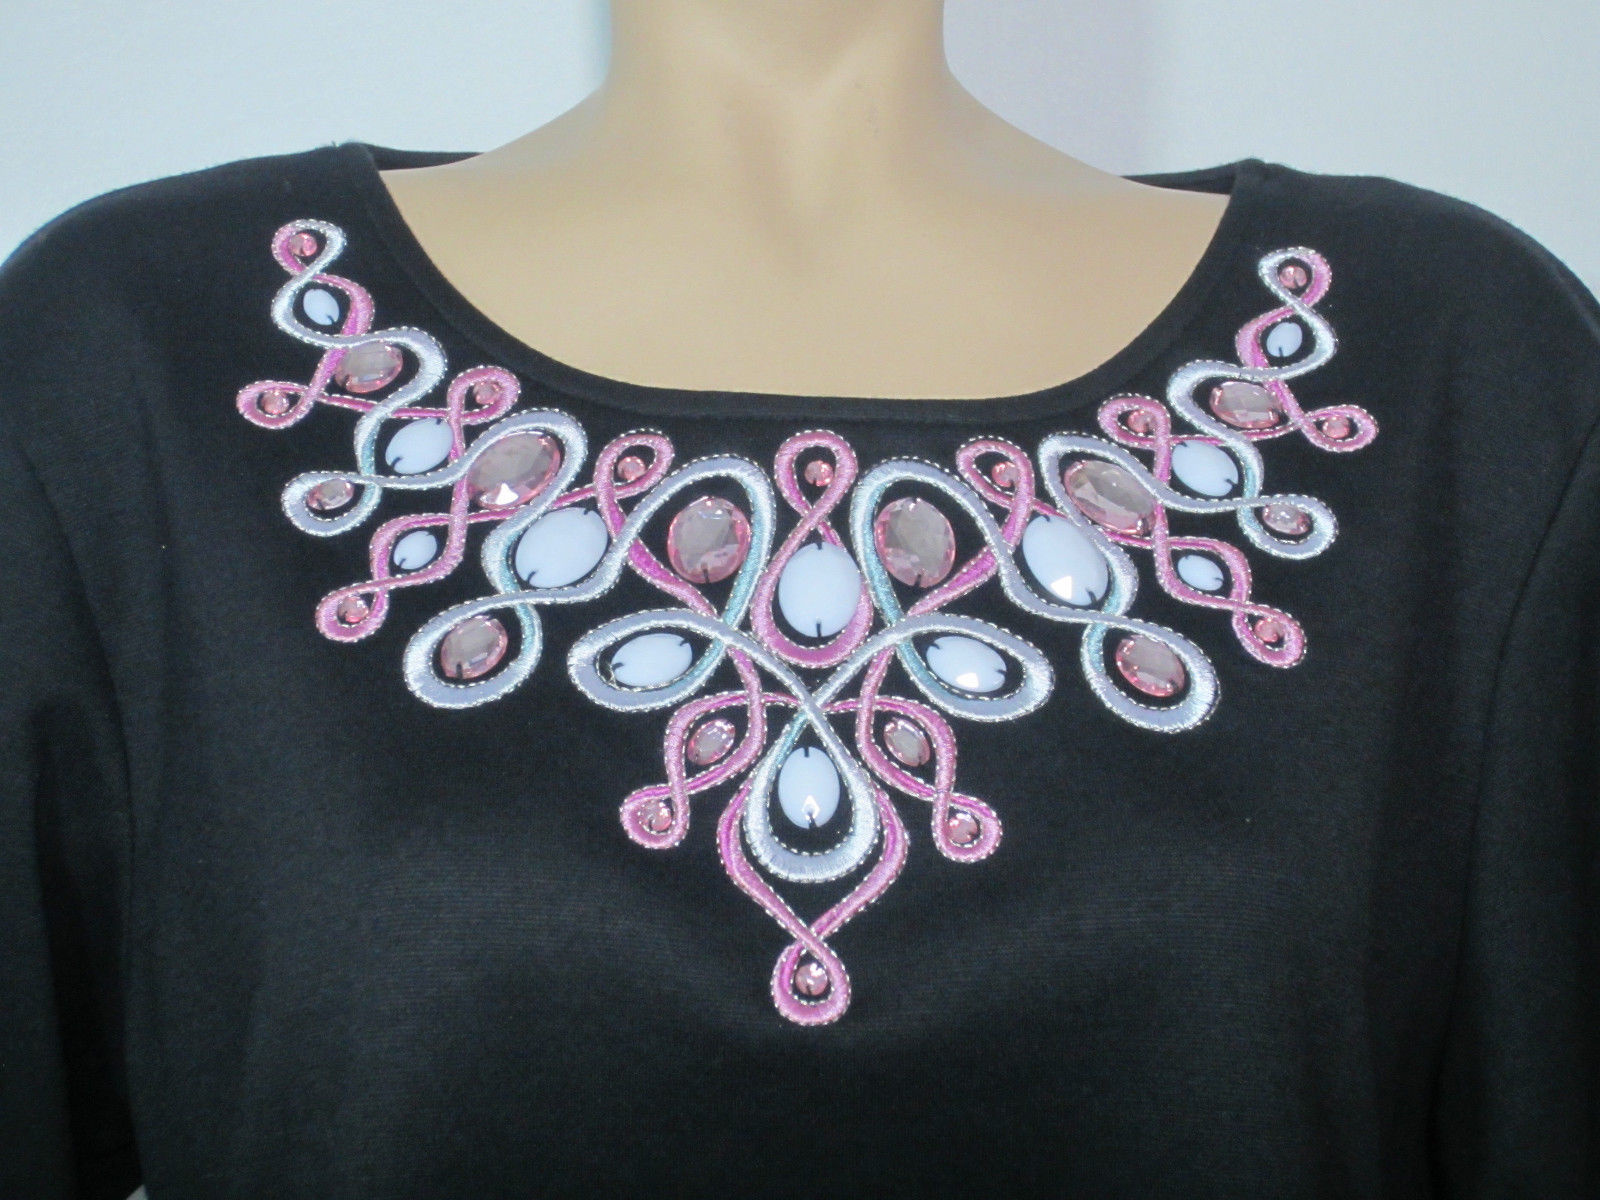 a42e2eabd0c551 Bob Mackie Wearable Art Women s Shirt Large and 50 similar items. 57